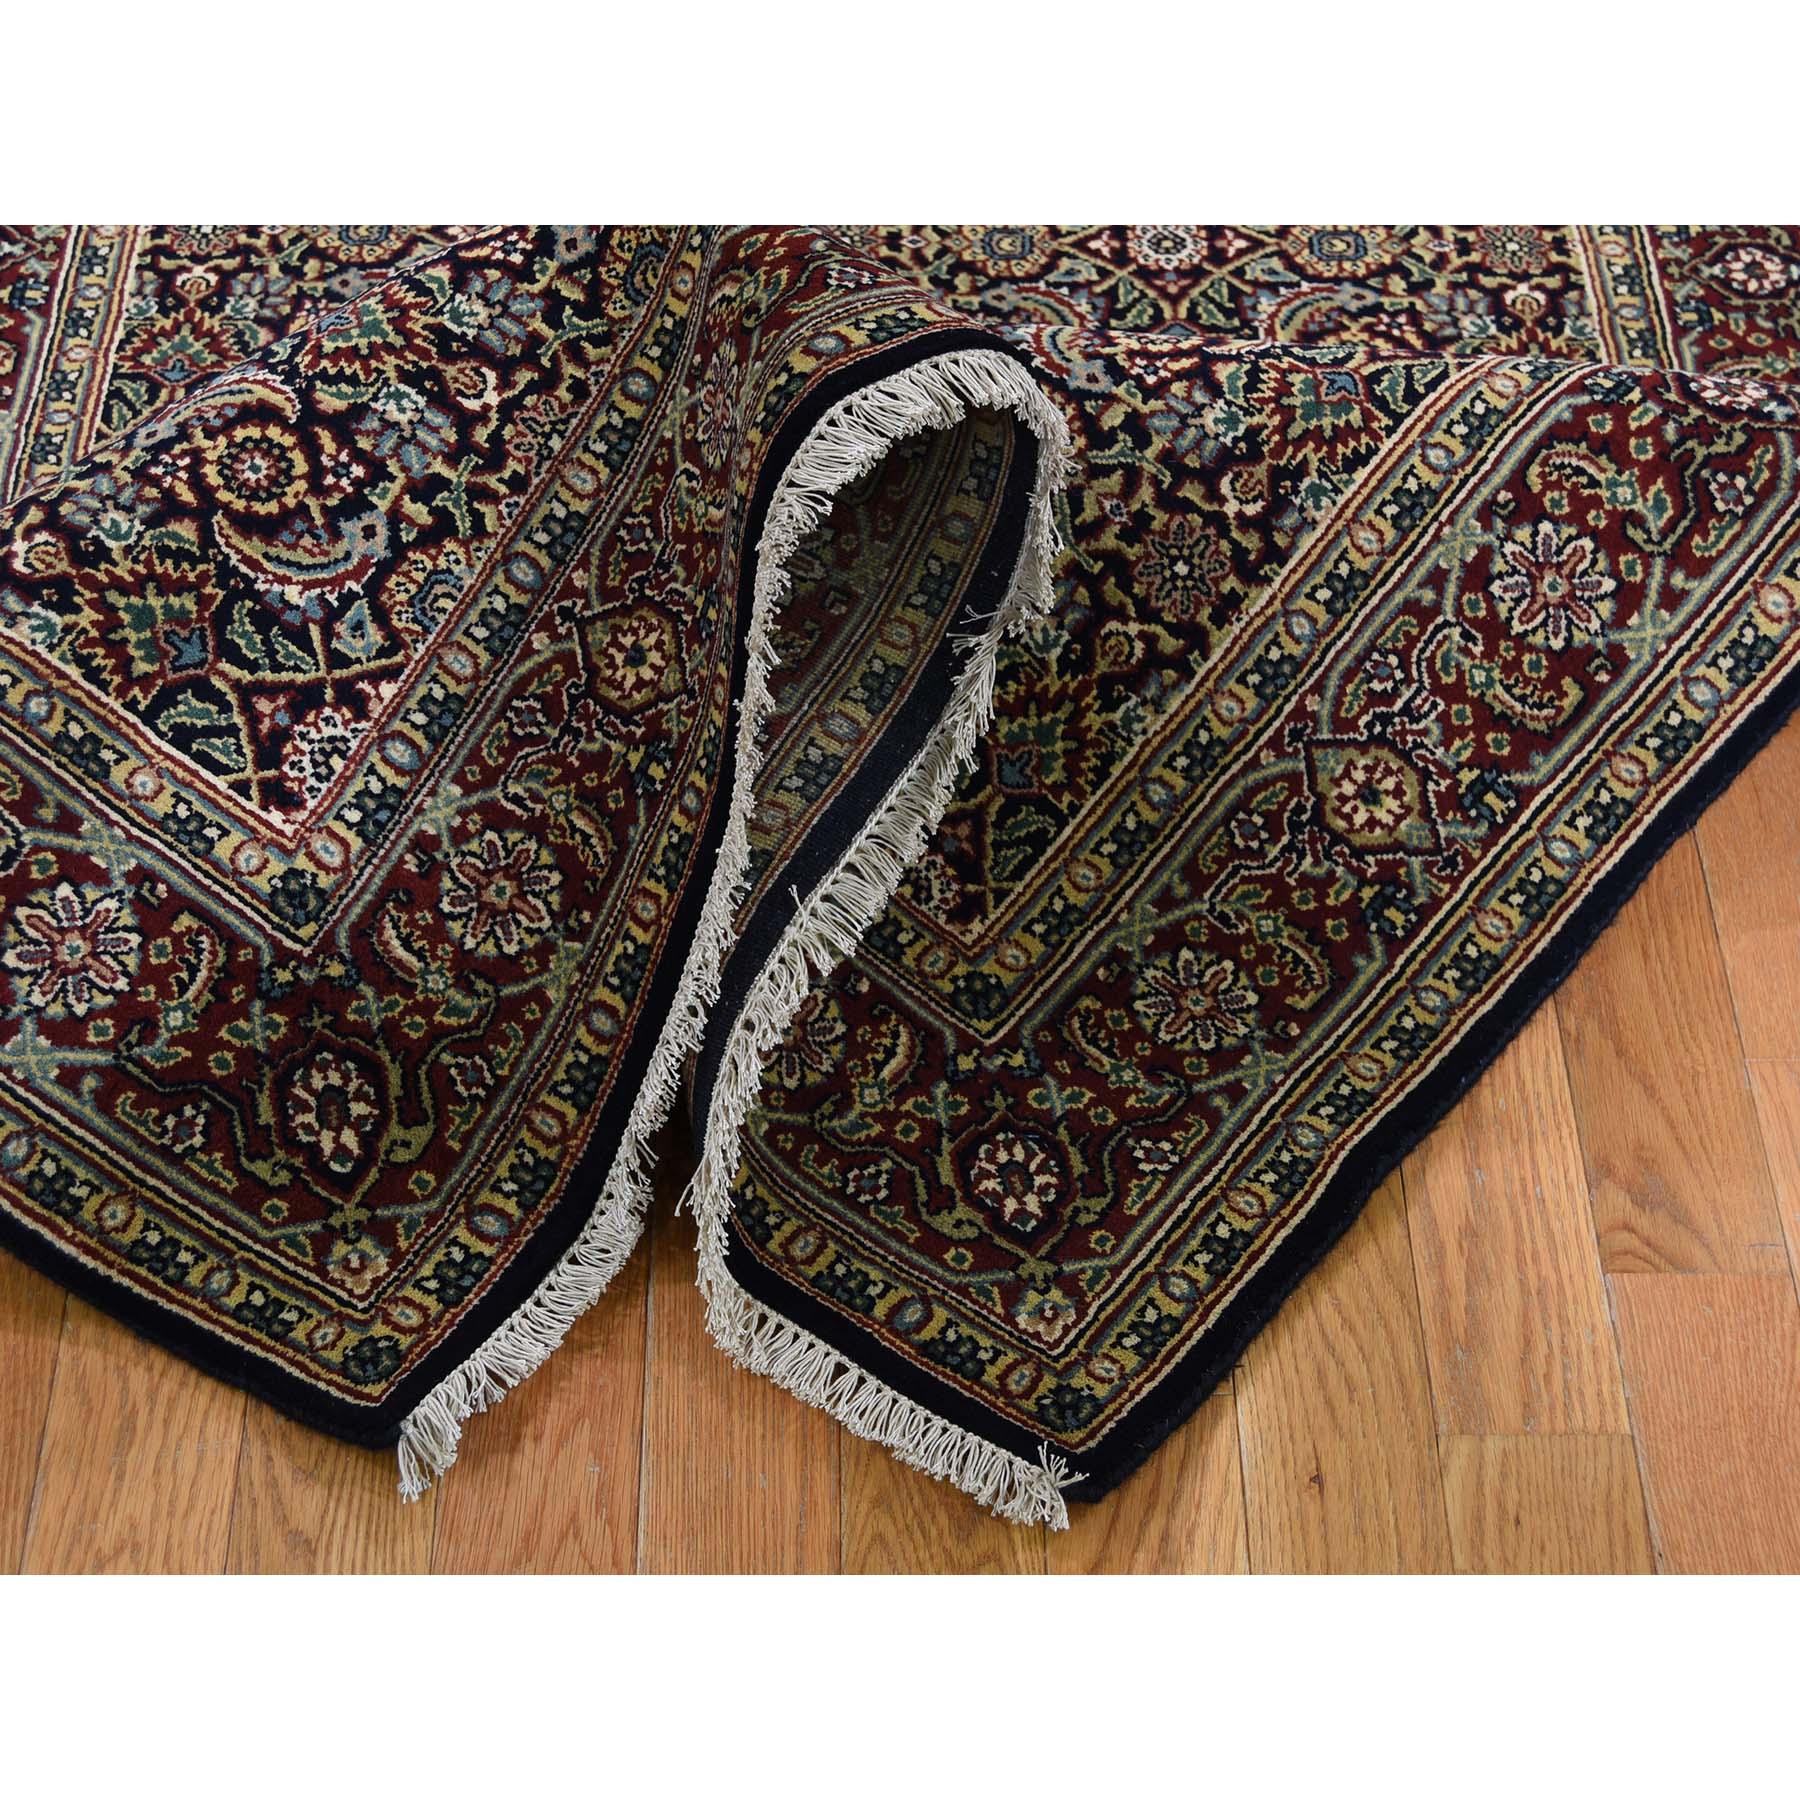 4-2 x19-10  Herati Wide Gallery Runner 300 KPSI  Hand-Knotted Oriental Rug